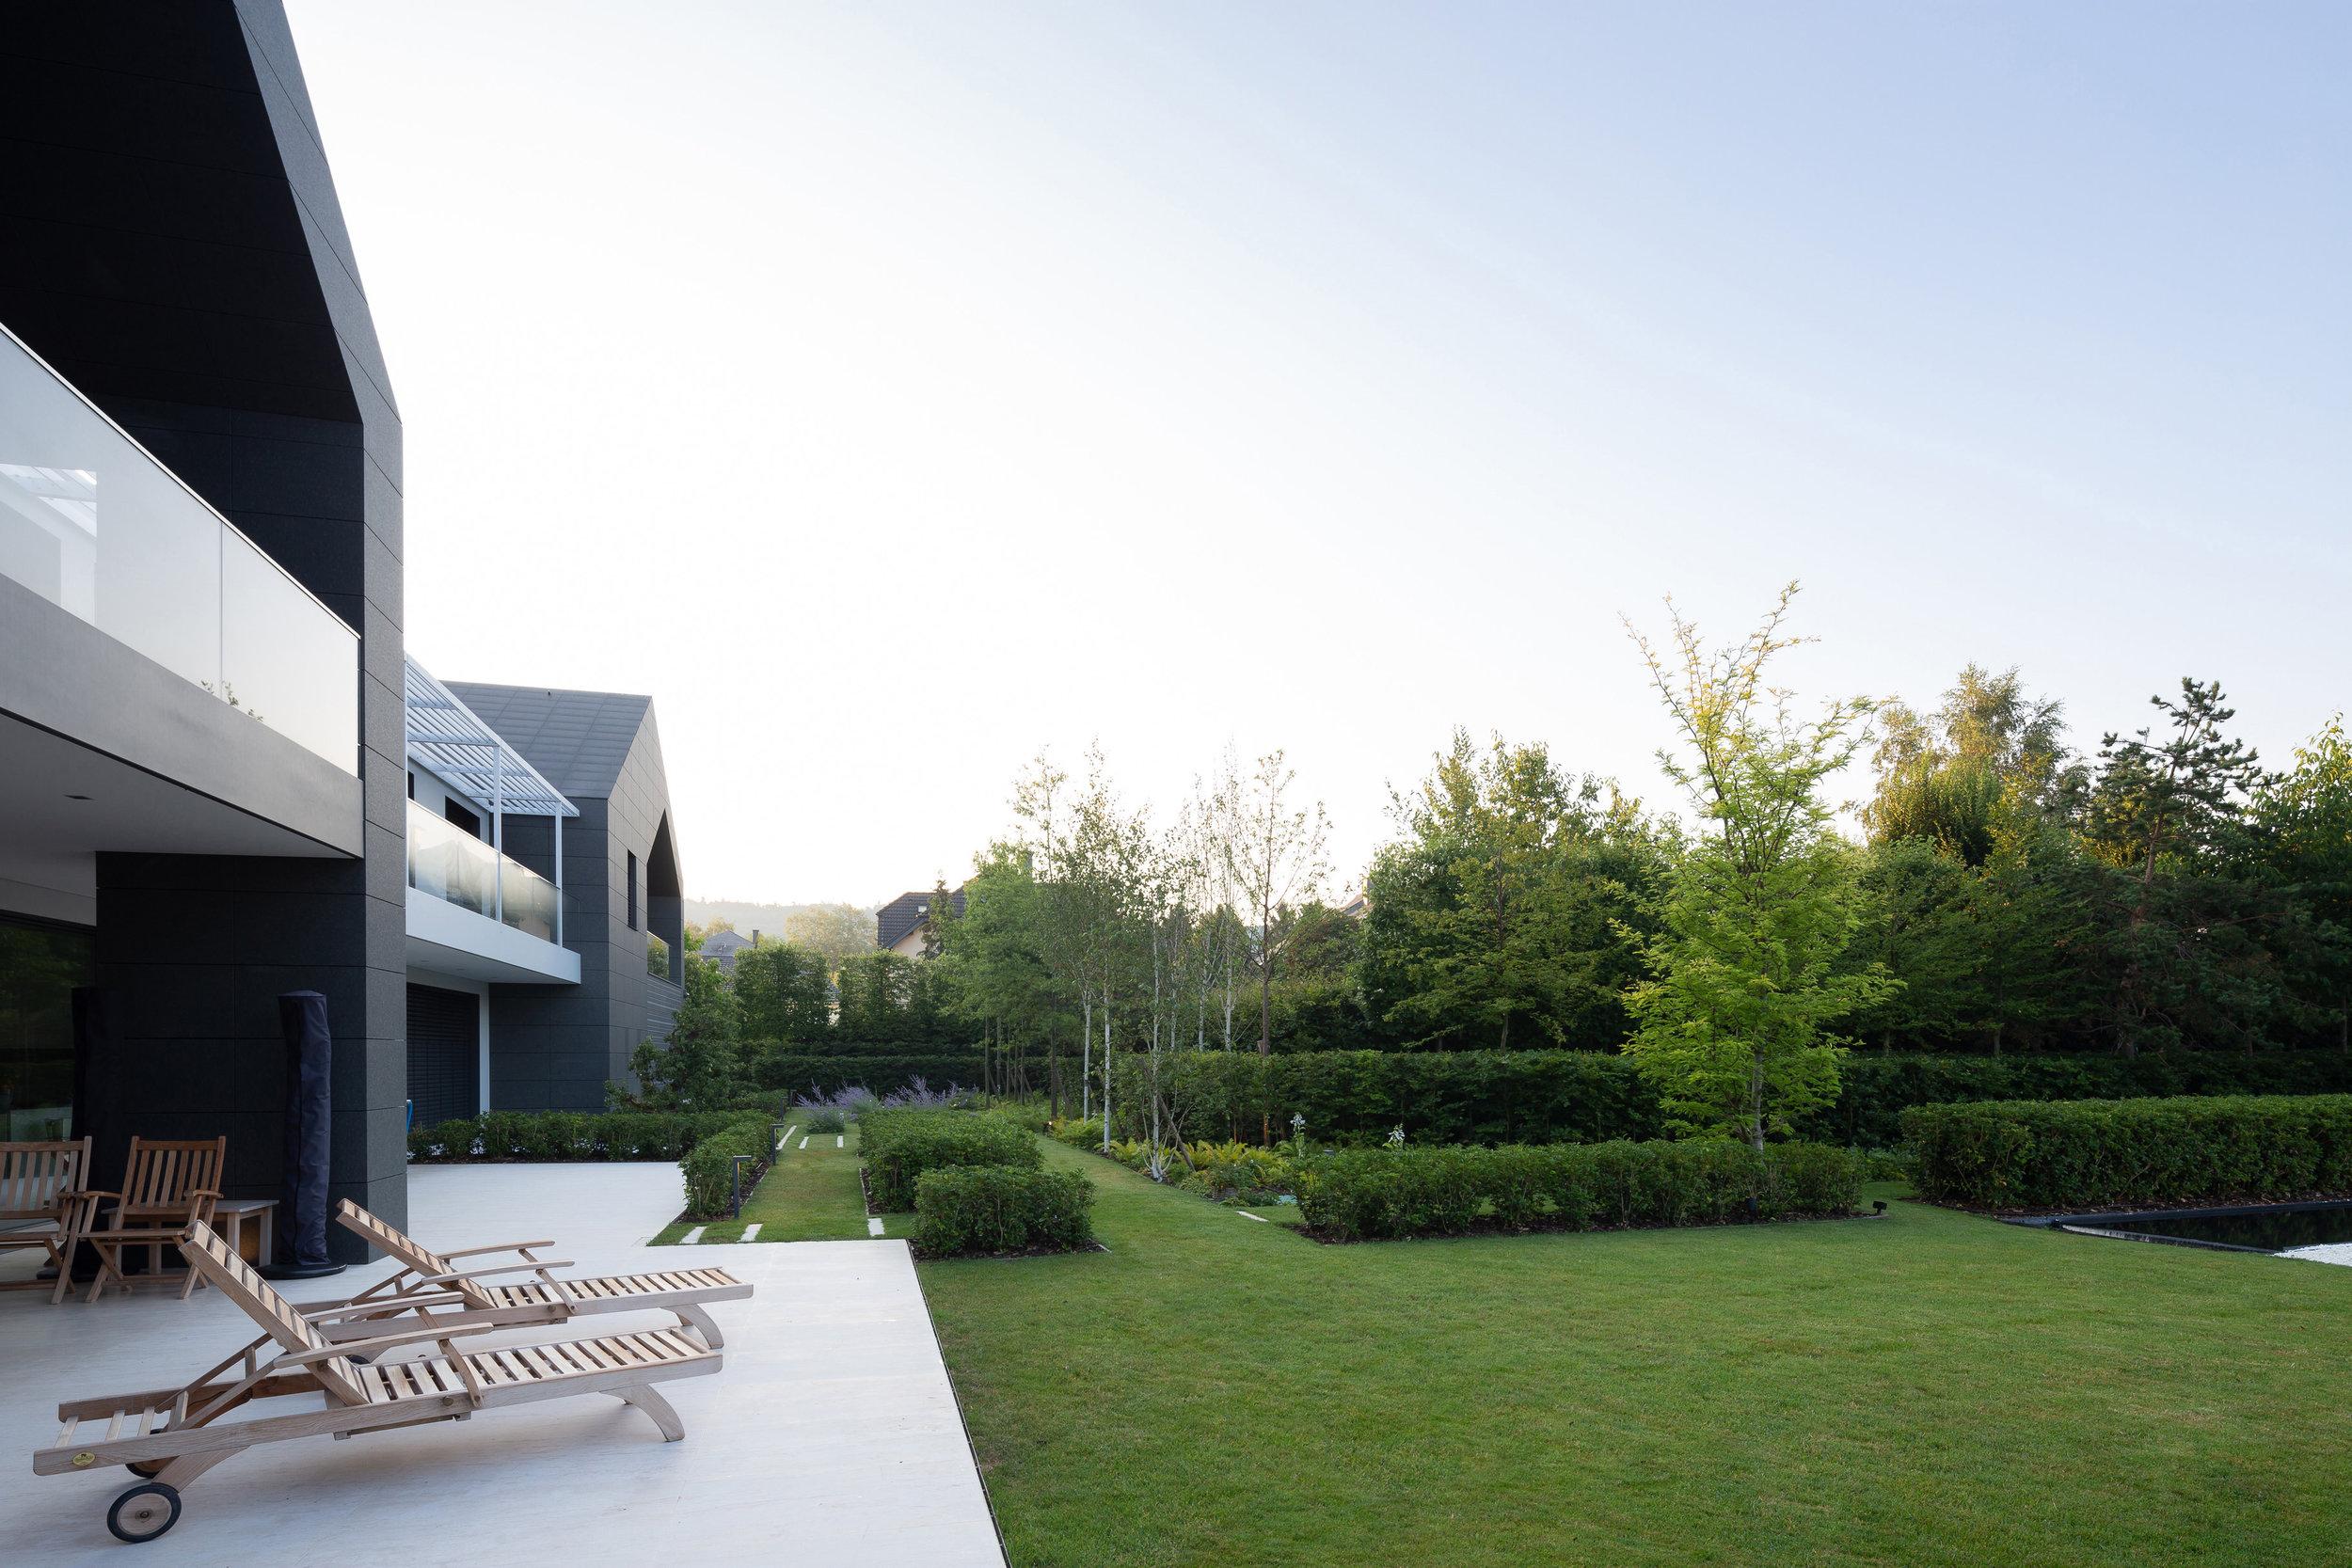 luxembourg_terraces_gardens_outdoor_landscape_designer_christophe_gautrand_2.jpg